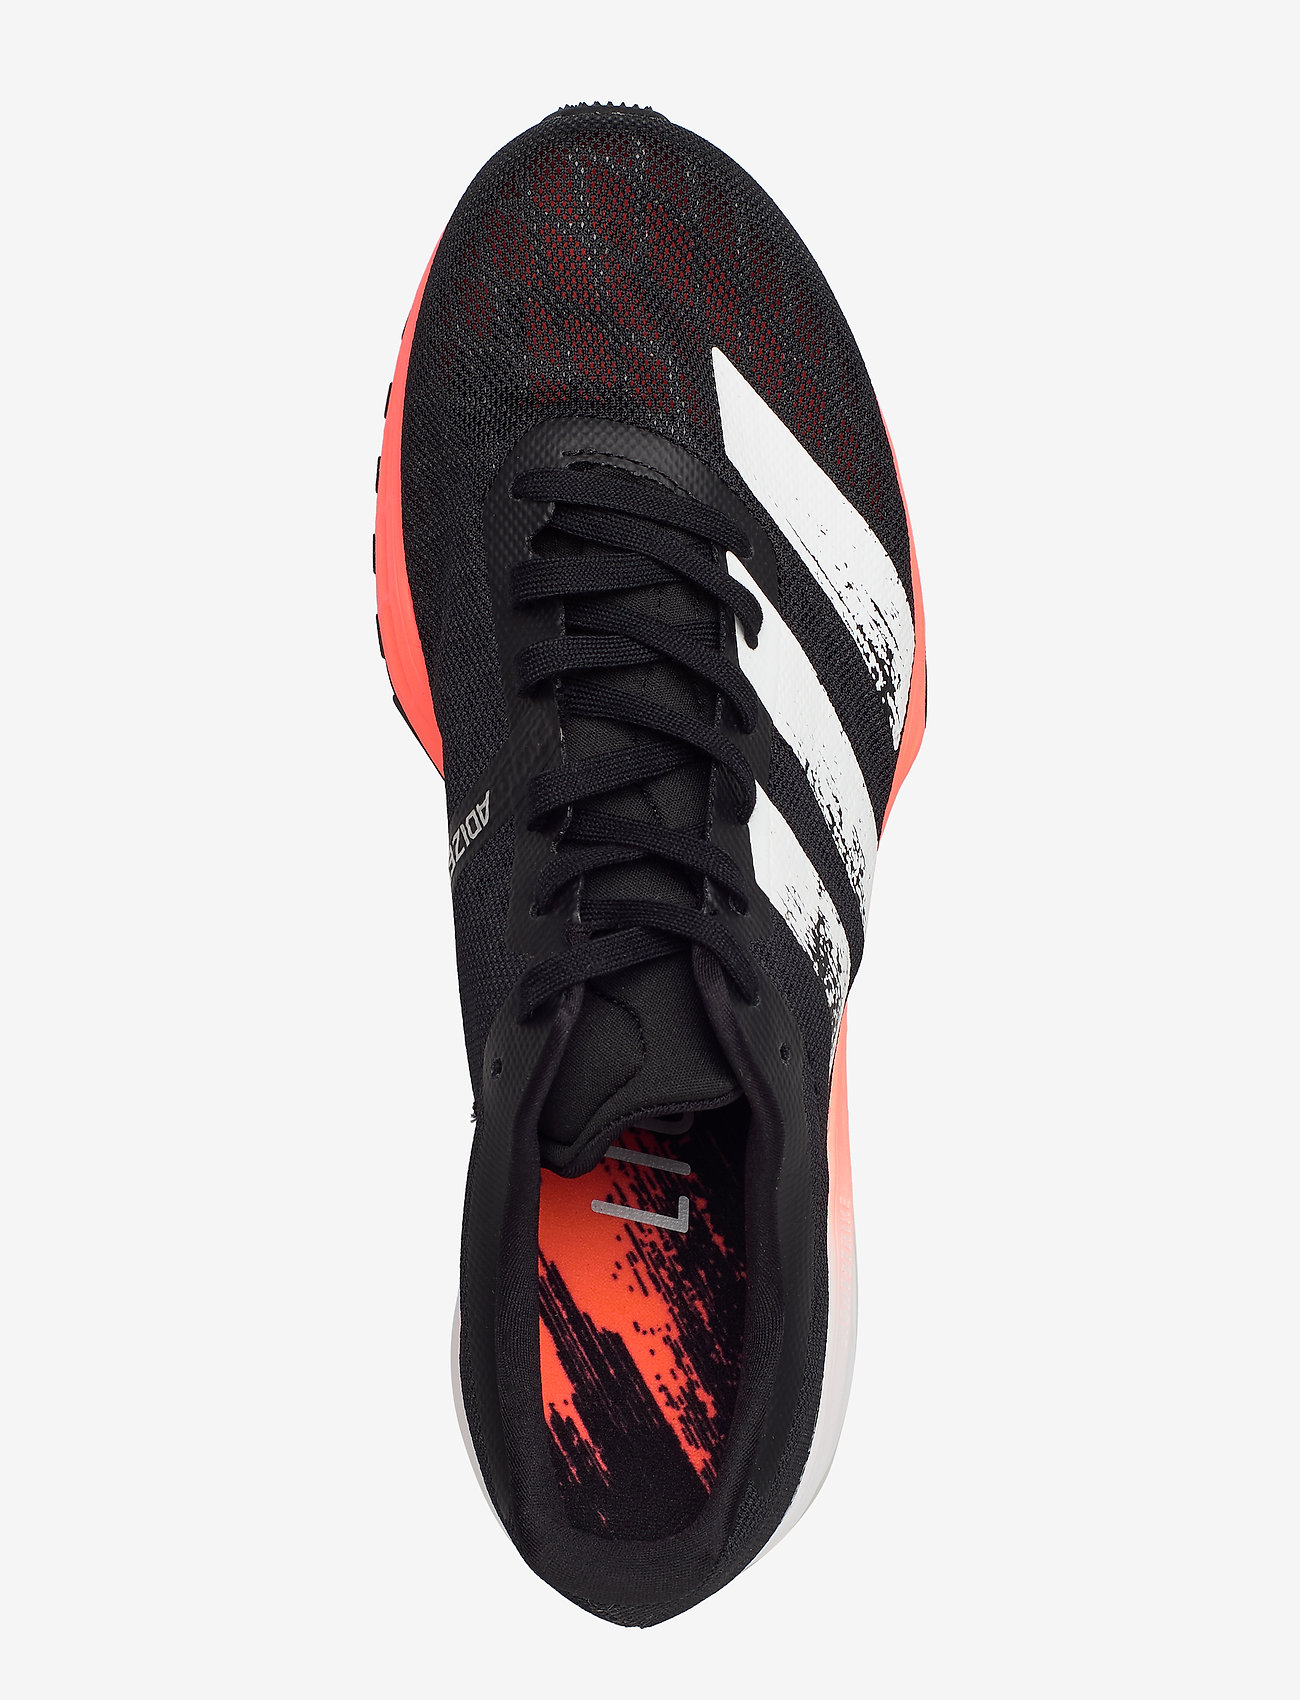 Adizero Rc 2 M (Cblack/ftwwht/cblack) - adidas Performance